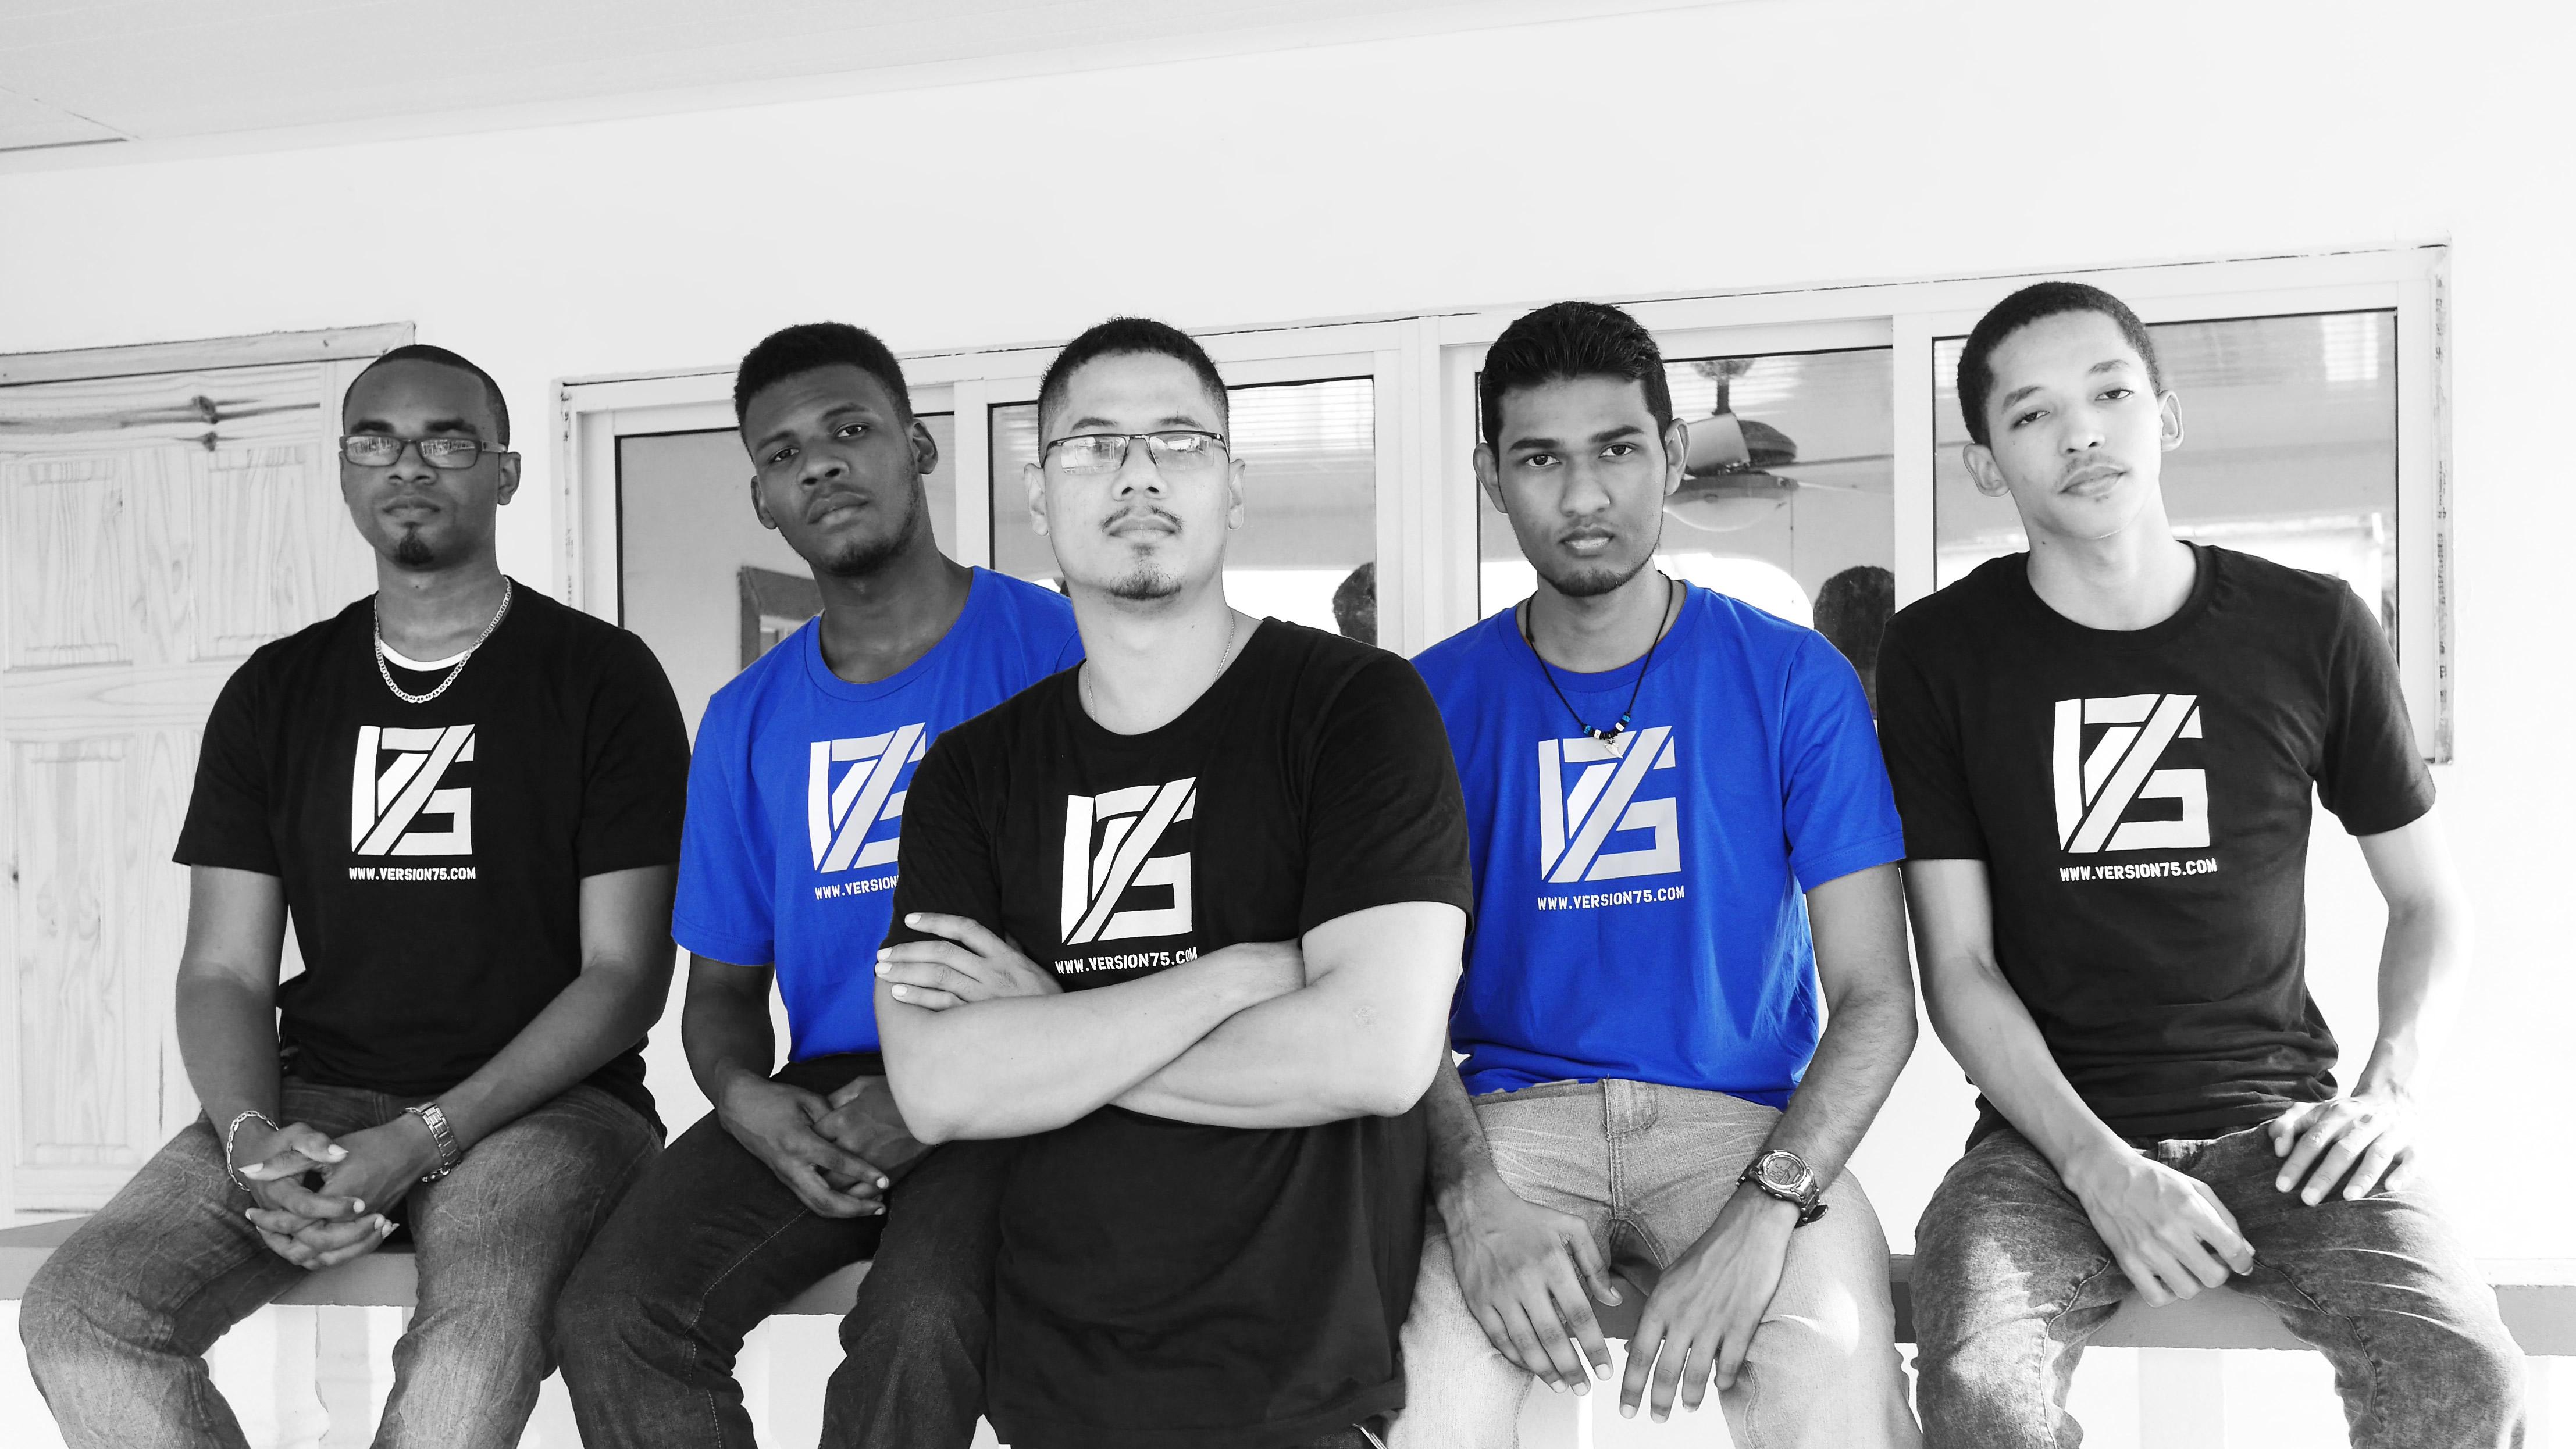 Design your t shirt software - We Create Software T Shirt Photo